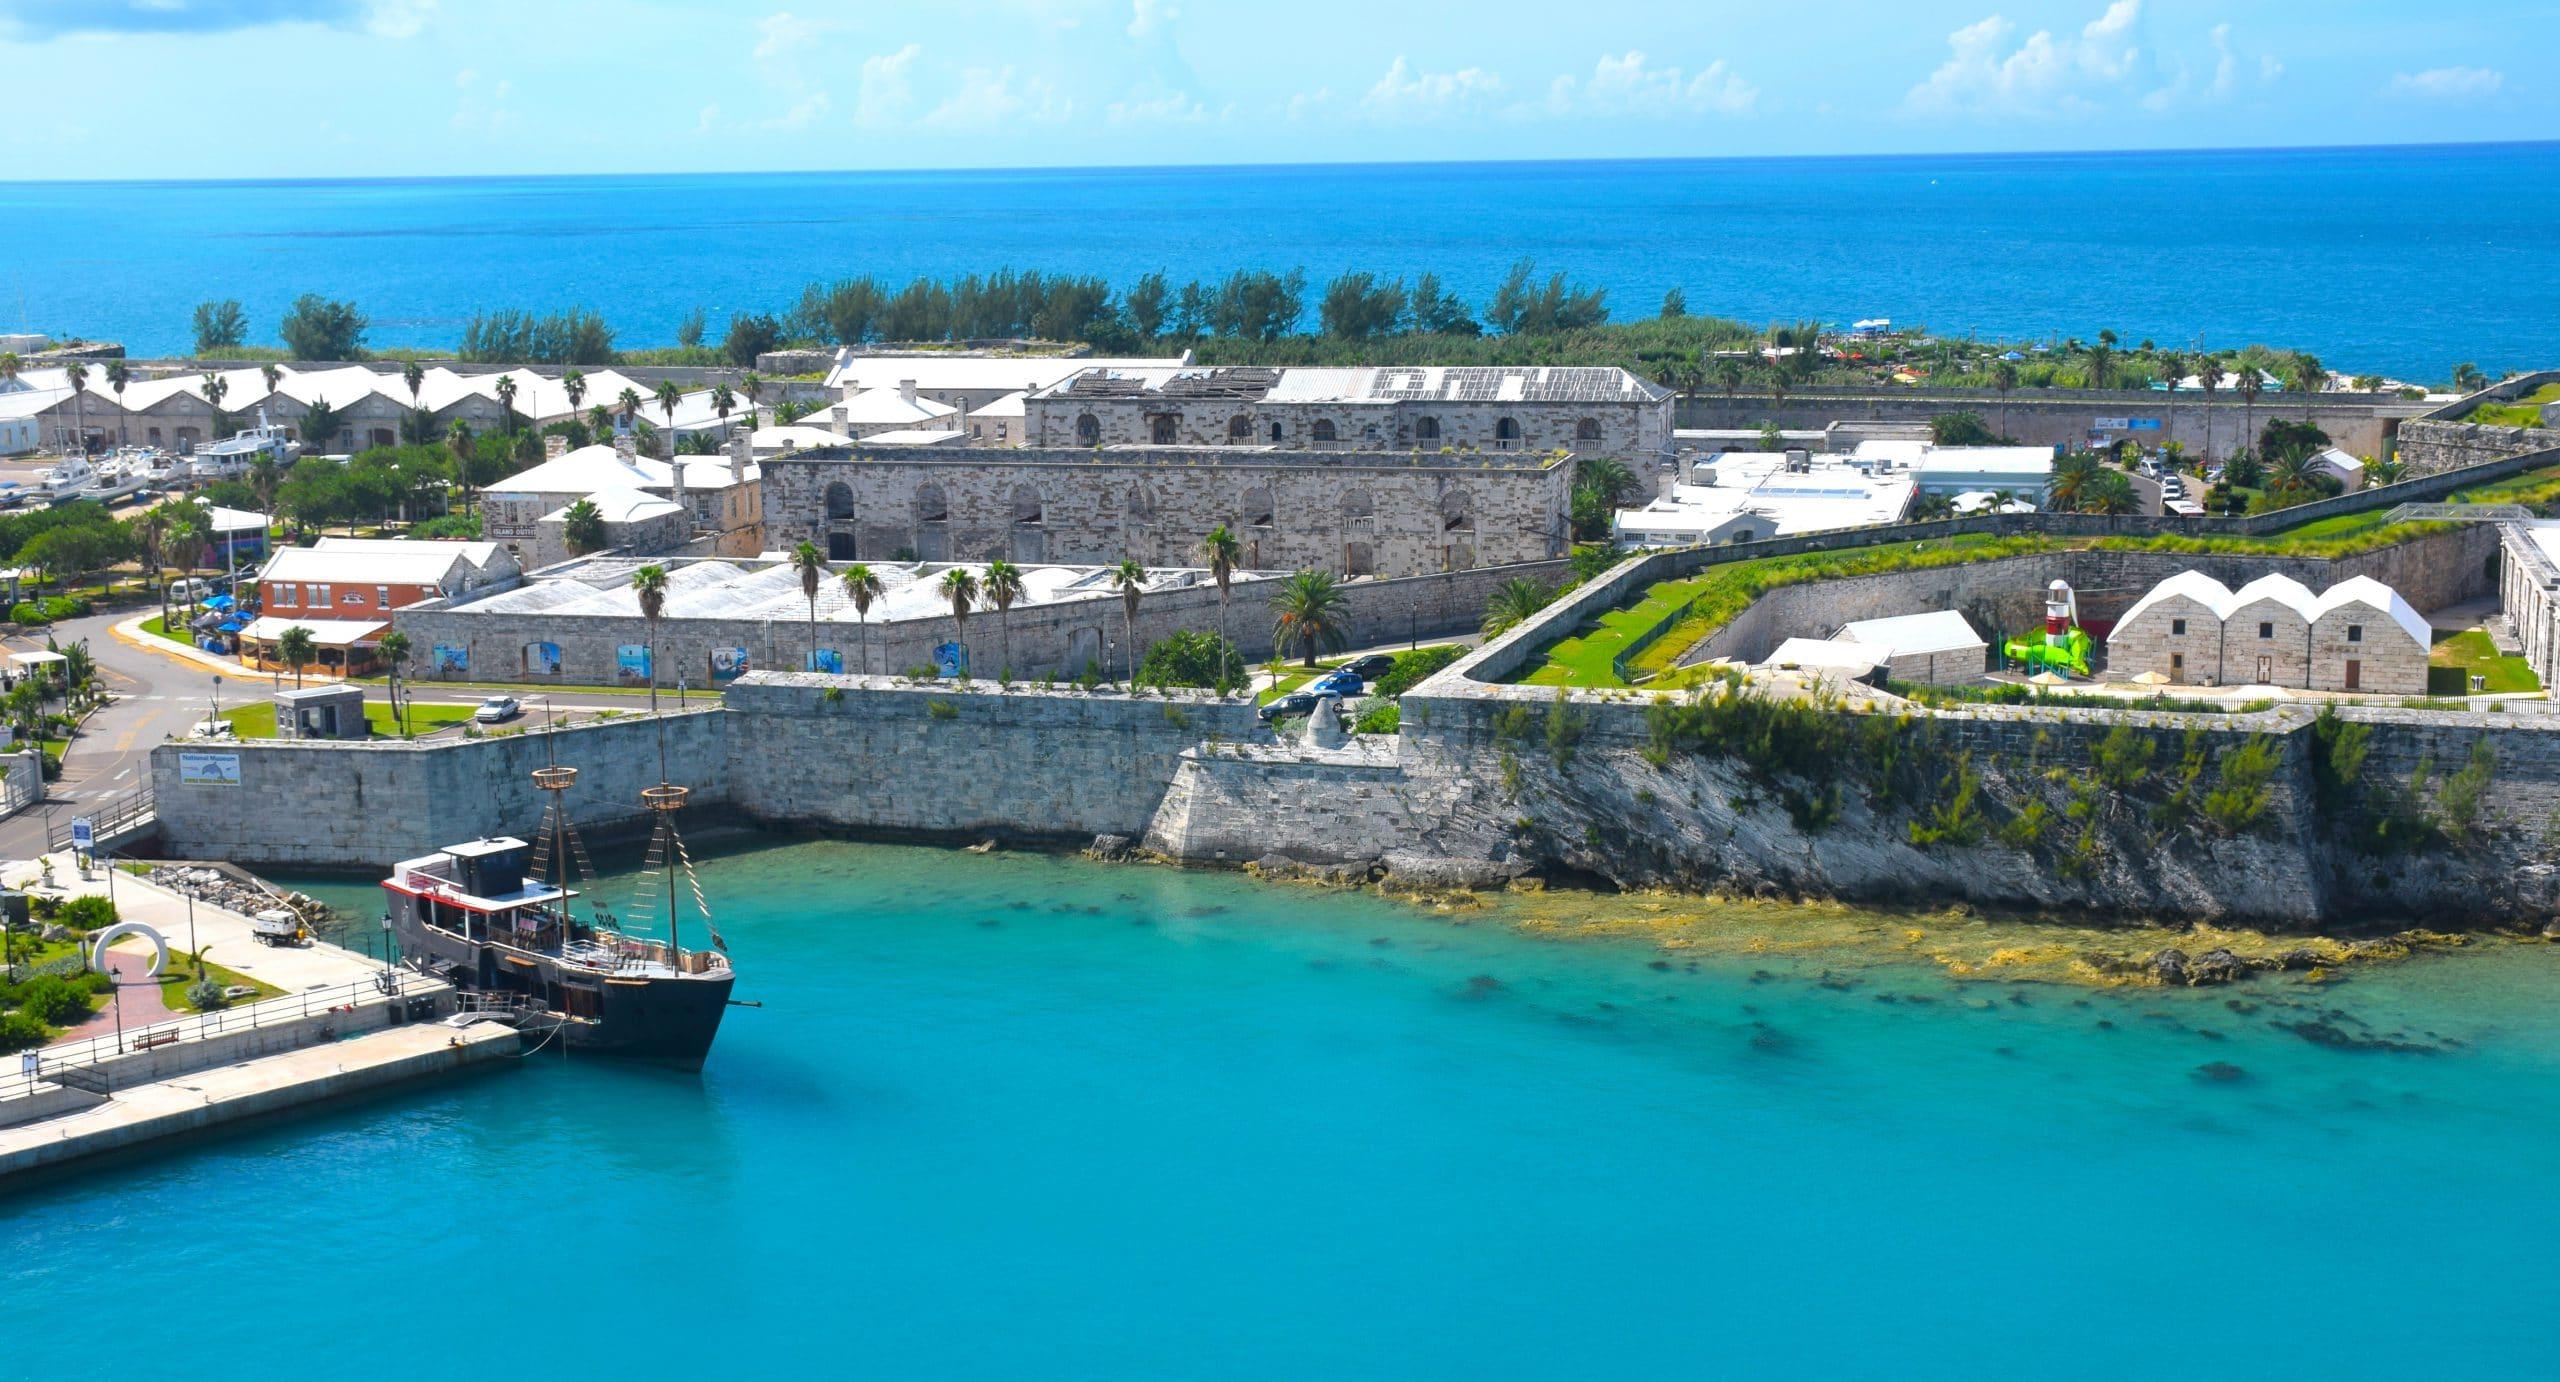 King's Wharf Bermuda Today